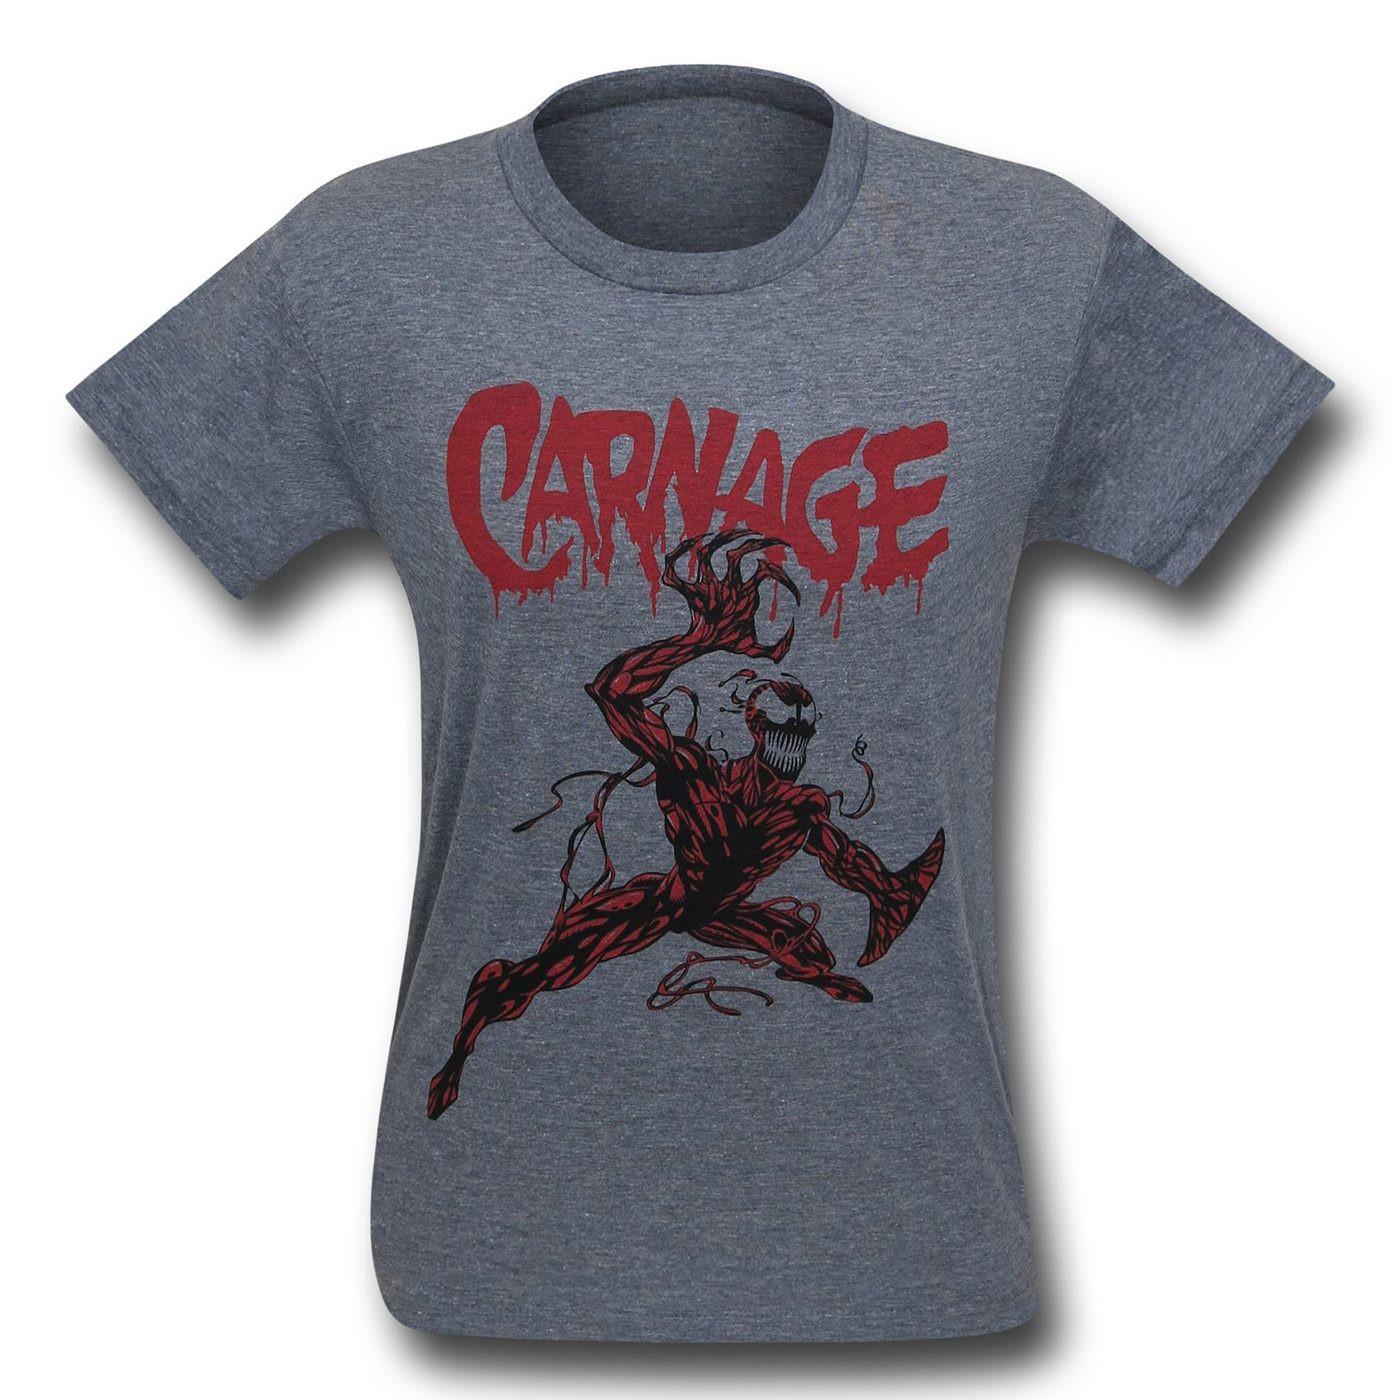 Carnage Action Pose Tri-Blend T-Shirt